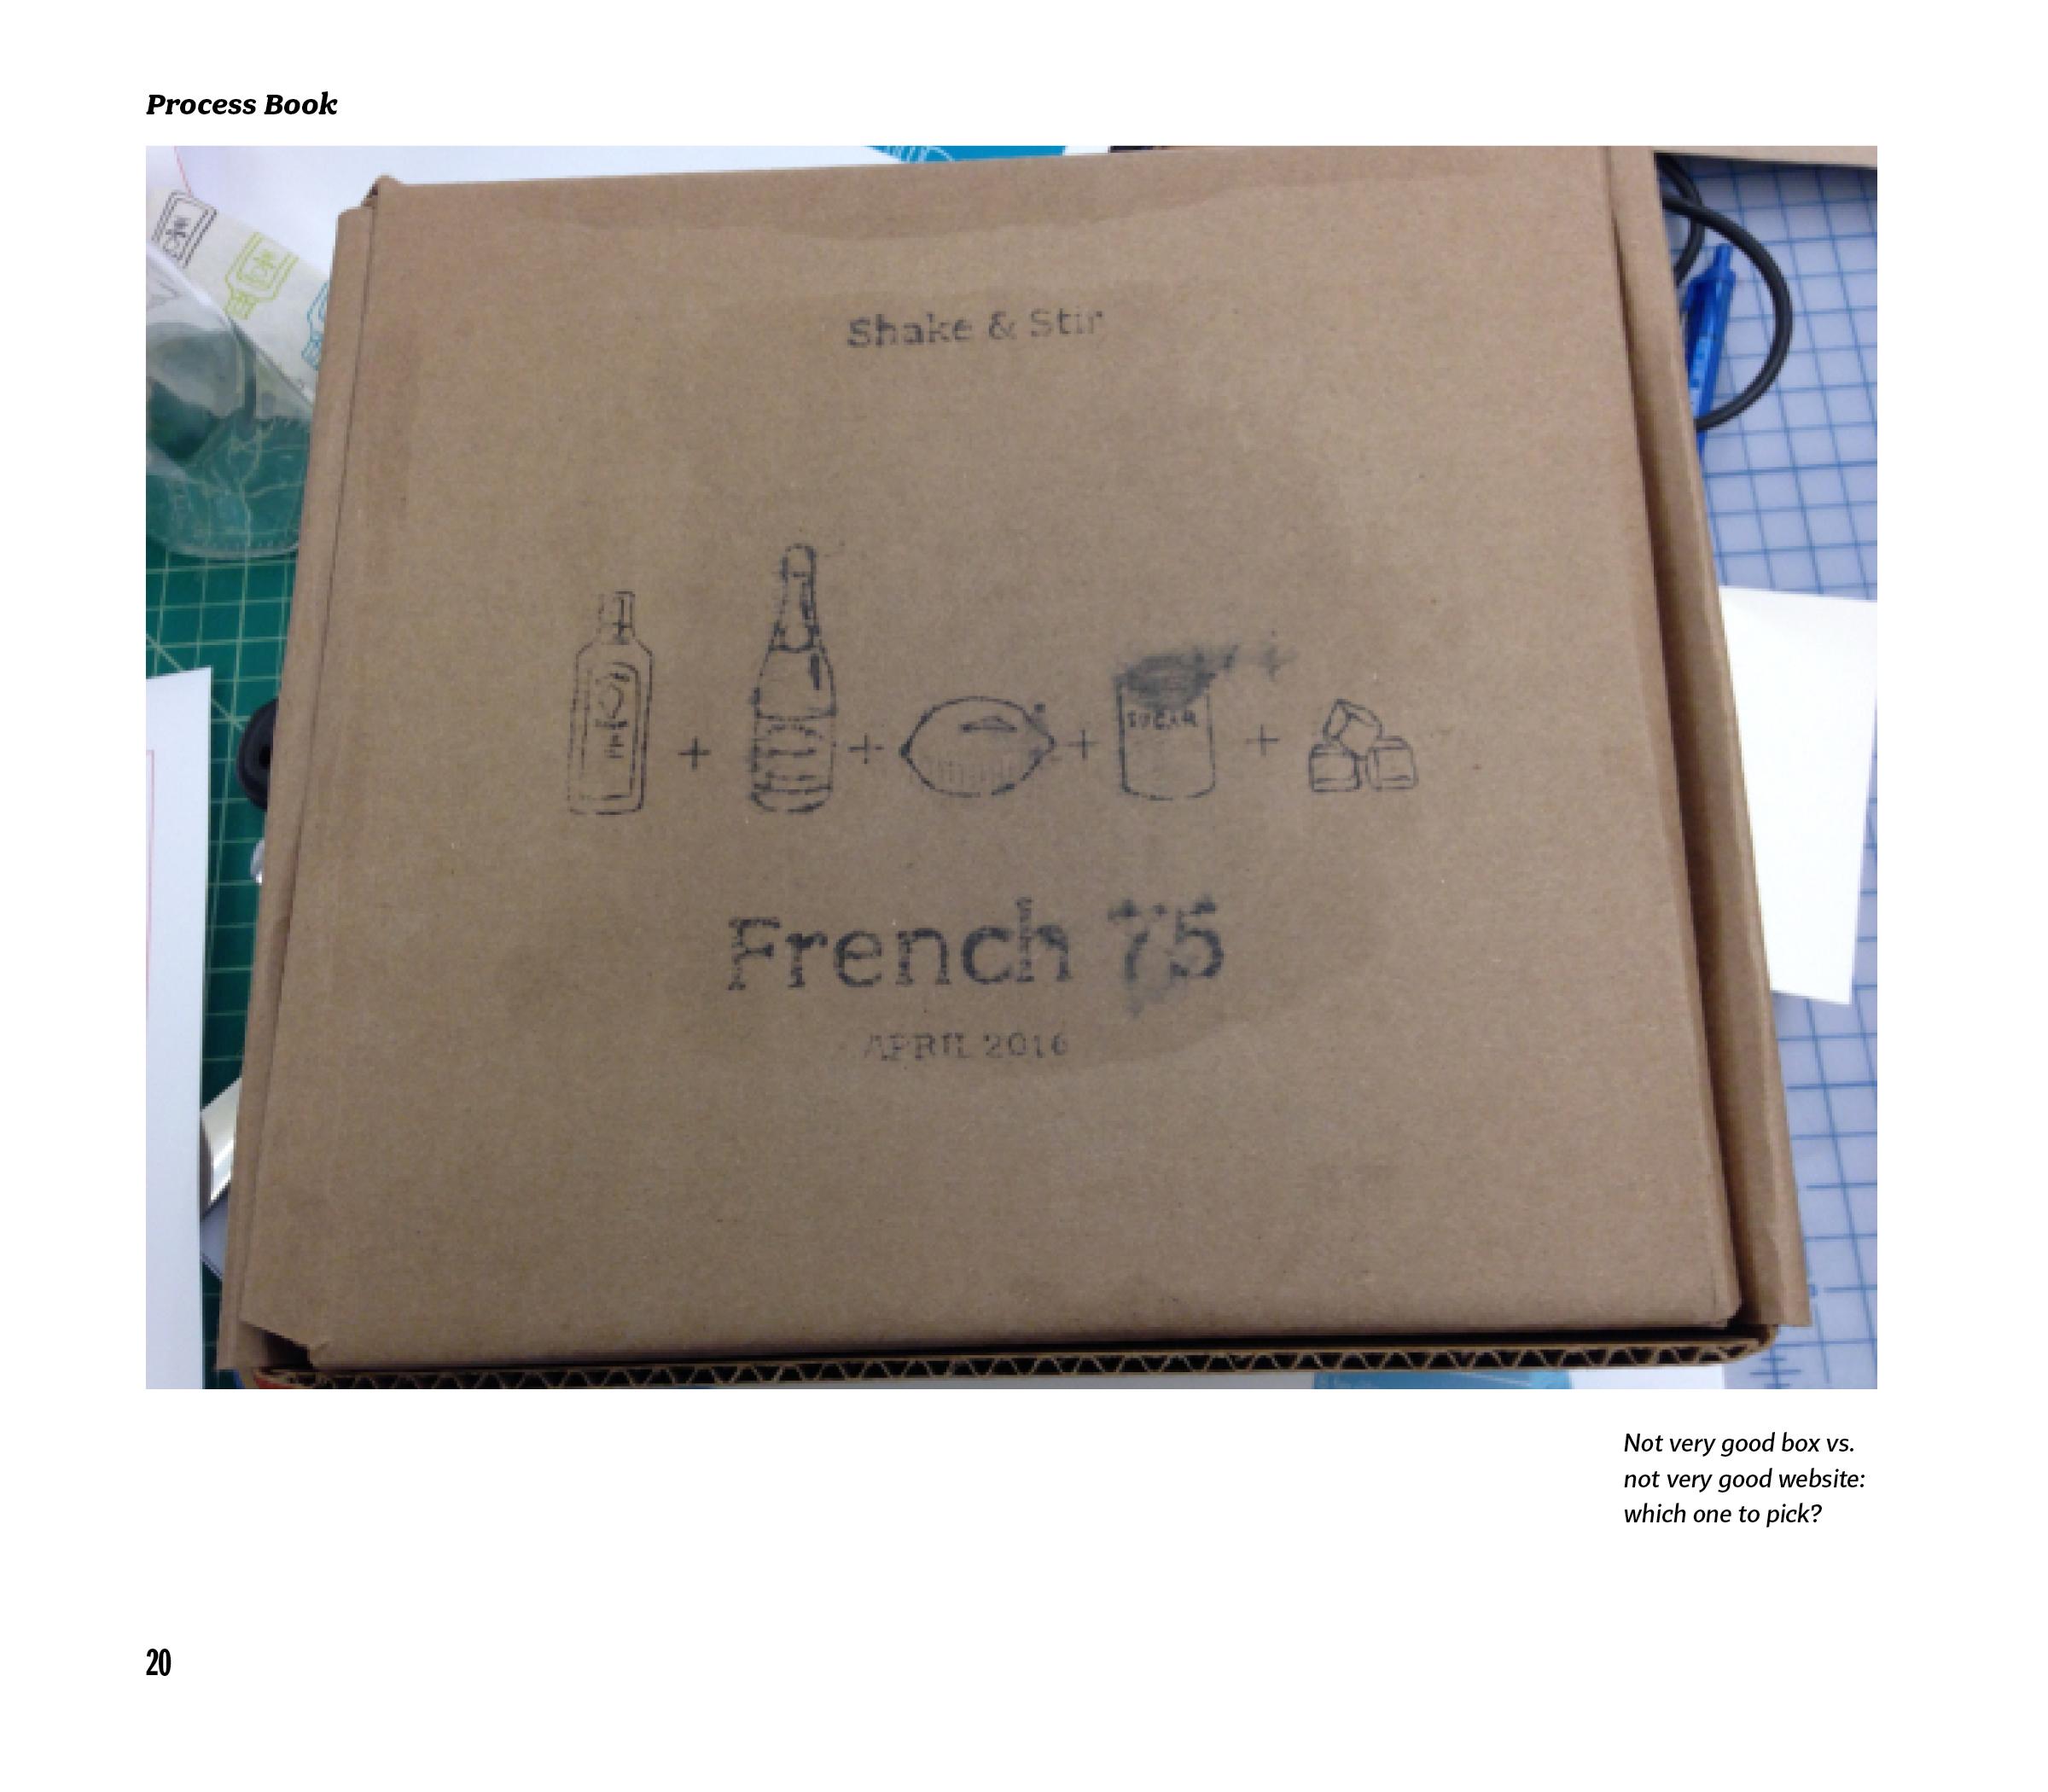 process book 220.jpg